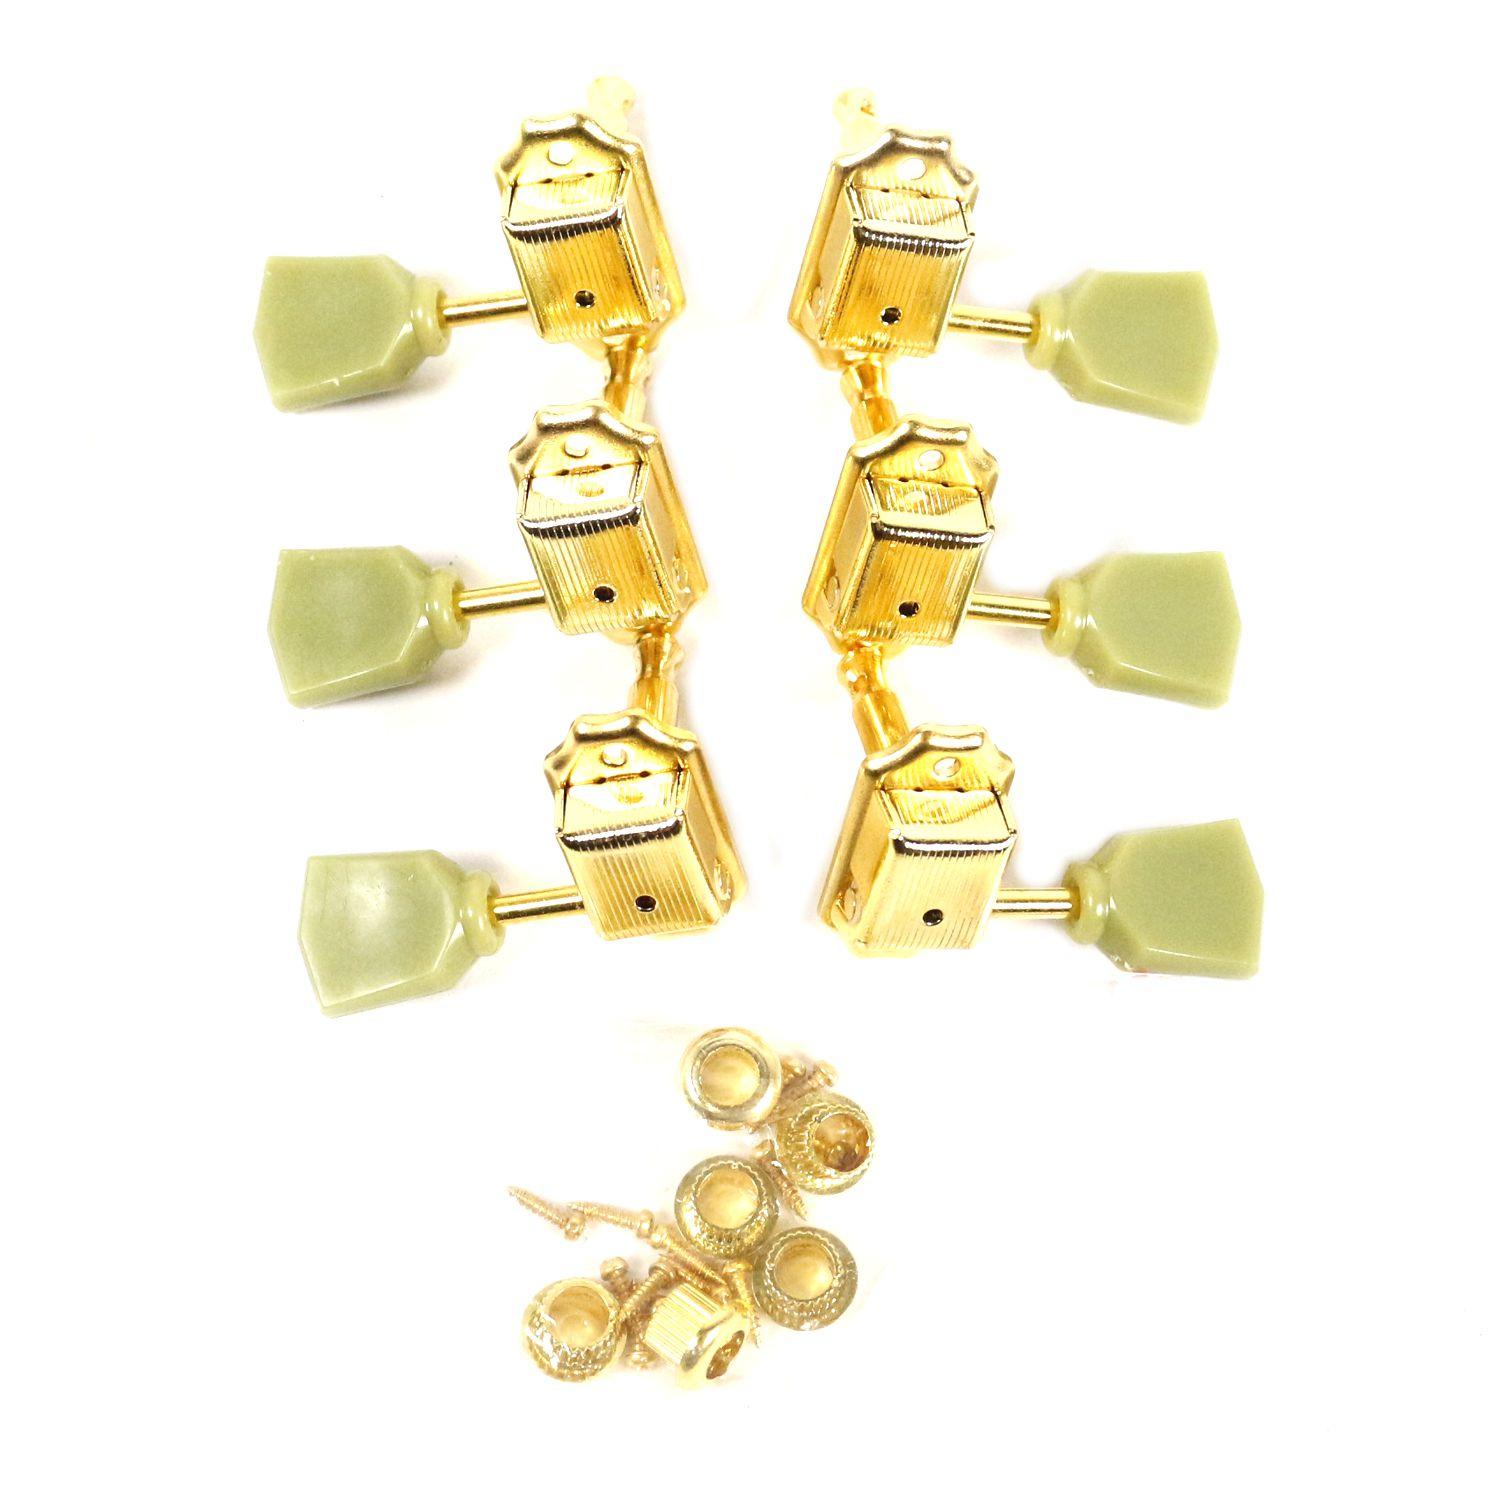 Jogo de Tarraxas para Guitarra LES Paul 3+3 MHL-52D Dourada e Vintage Green - Ronsani